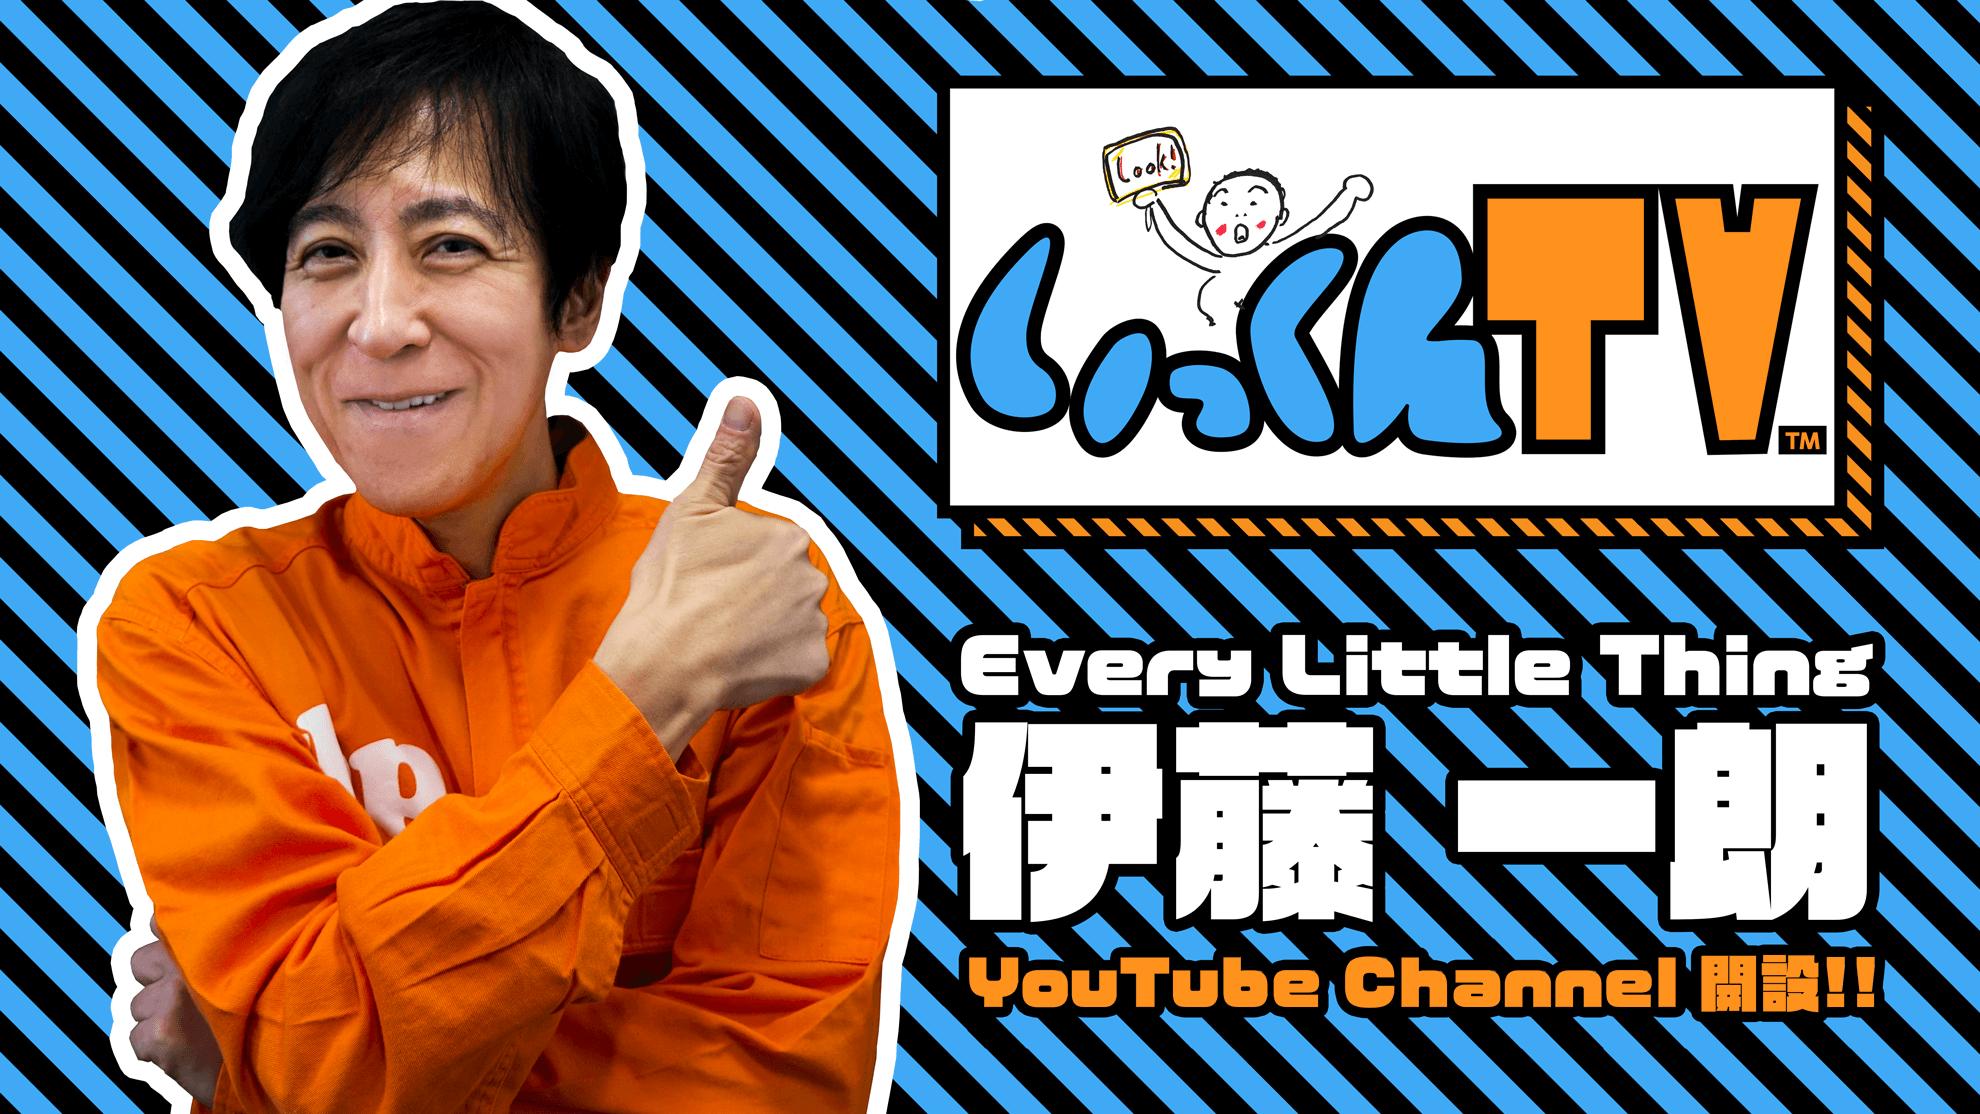 Every Little Thing 伊藤 一朗 YouTubeチャンネル開設